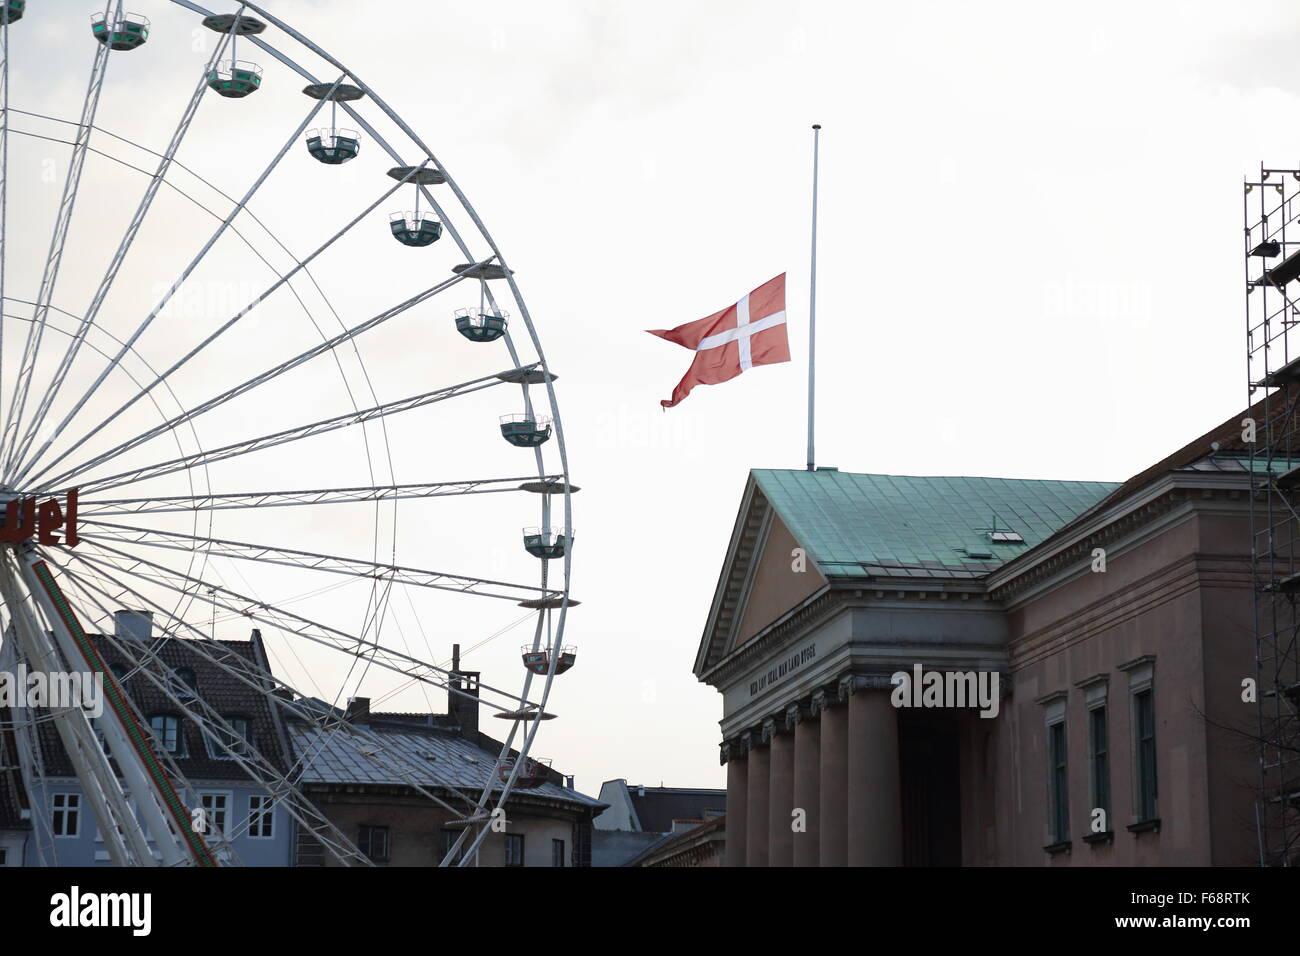 Copenhagen, Denmark. 14th November, 2015. The Danish flag is flown at half mast on public buildings and around the Stock Photo